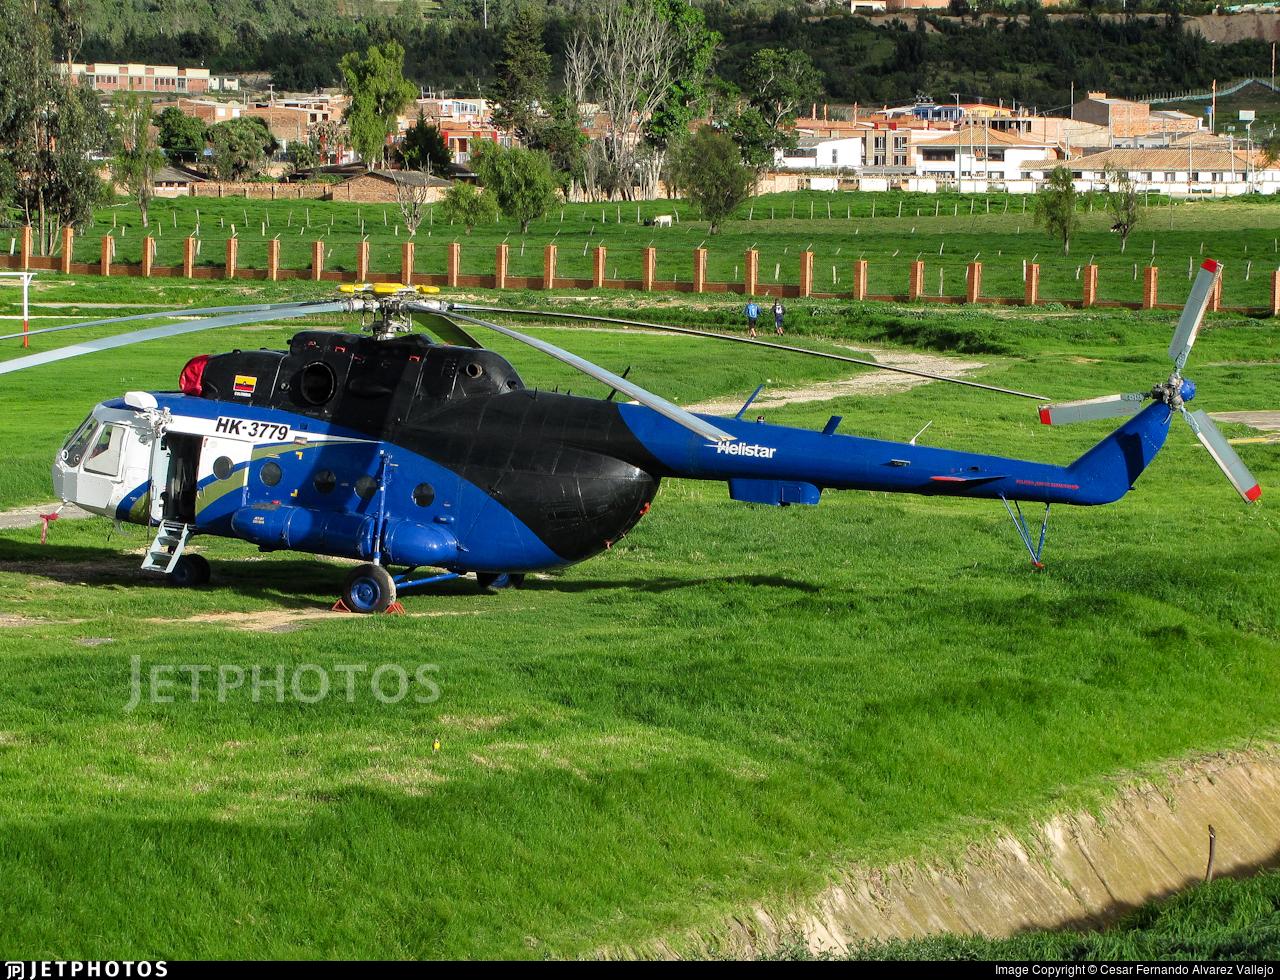 HK-3779 - Mil Mi-17 Hip - HeliStar